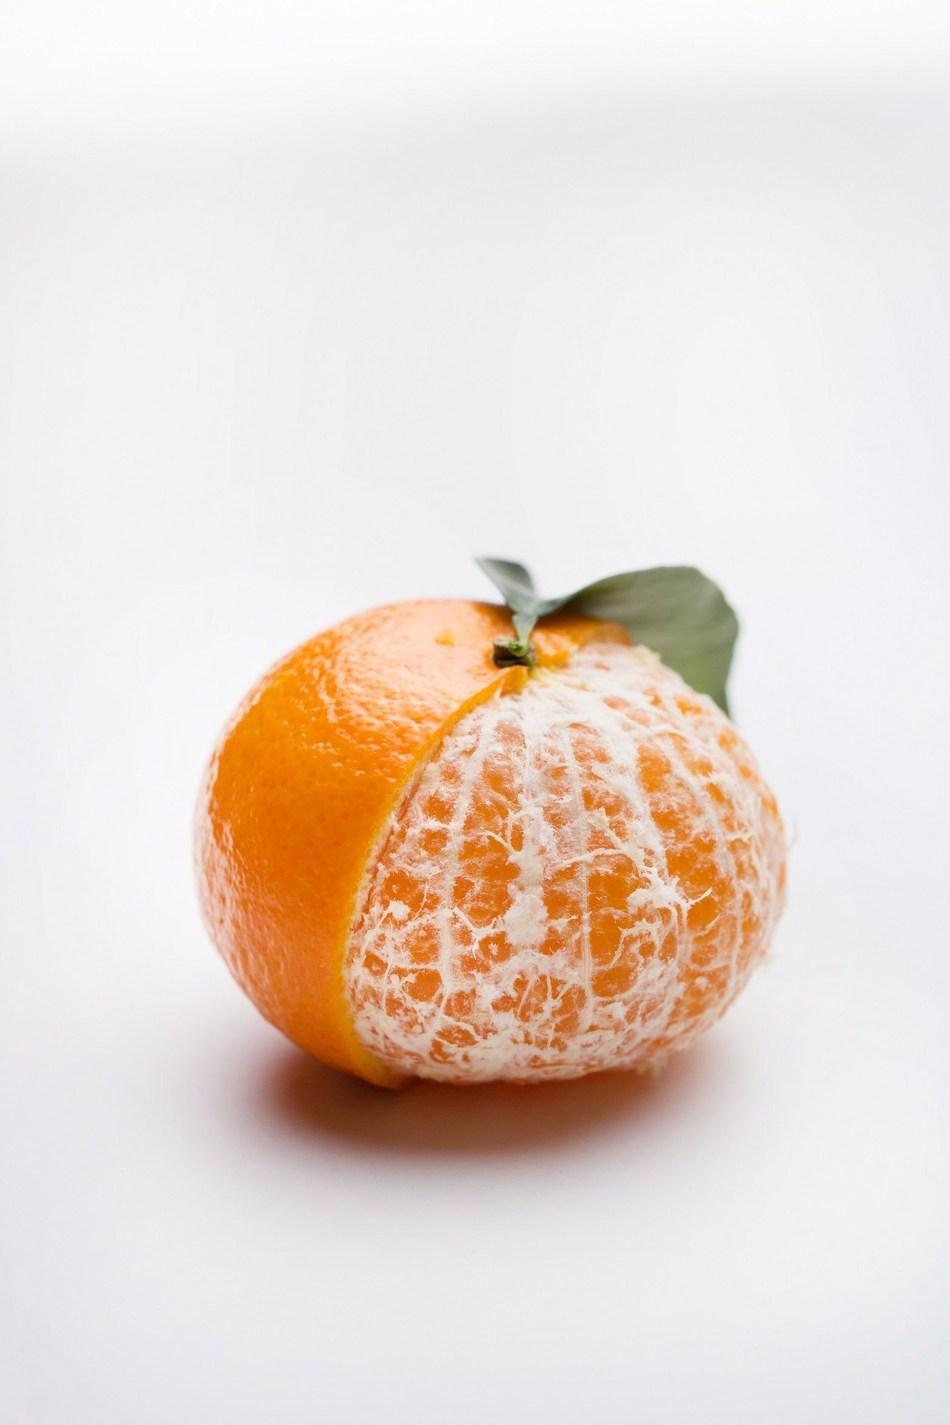 100% biological control for Orri Jaffa mandarin farmers. (PRNewsfoto/Orri Jaffa)